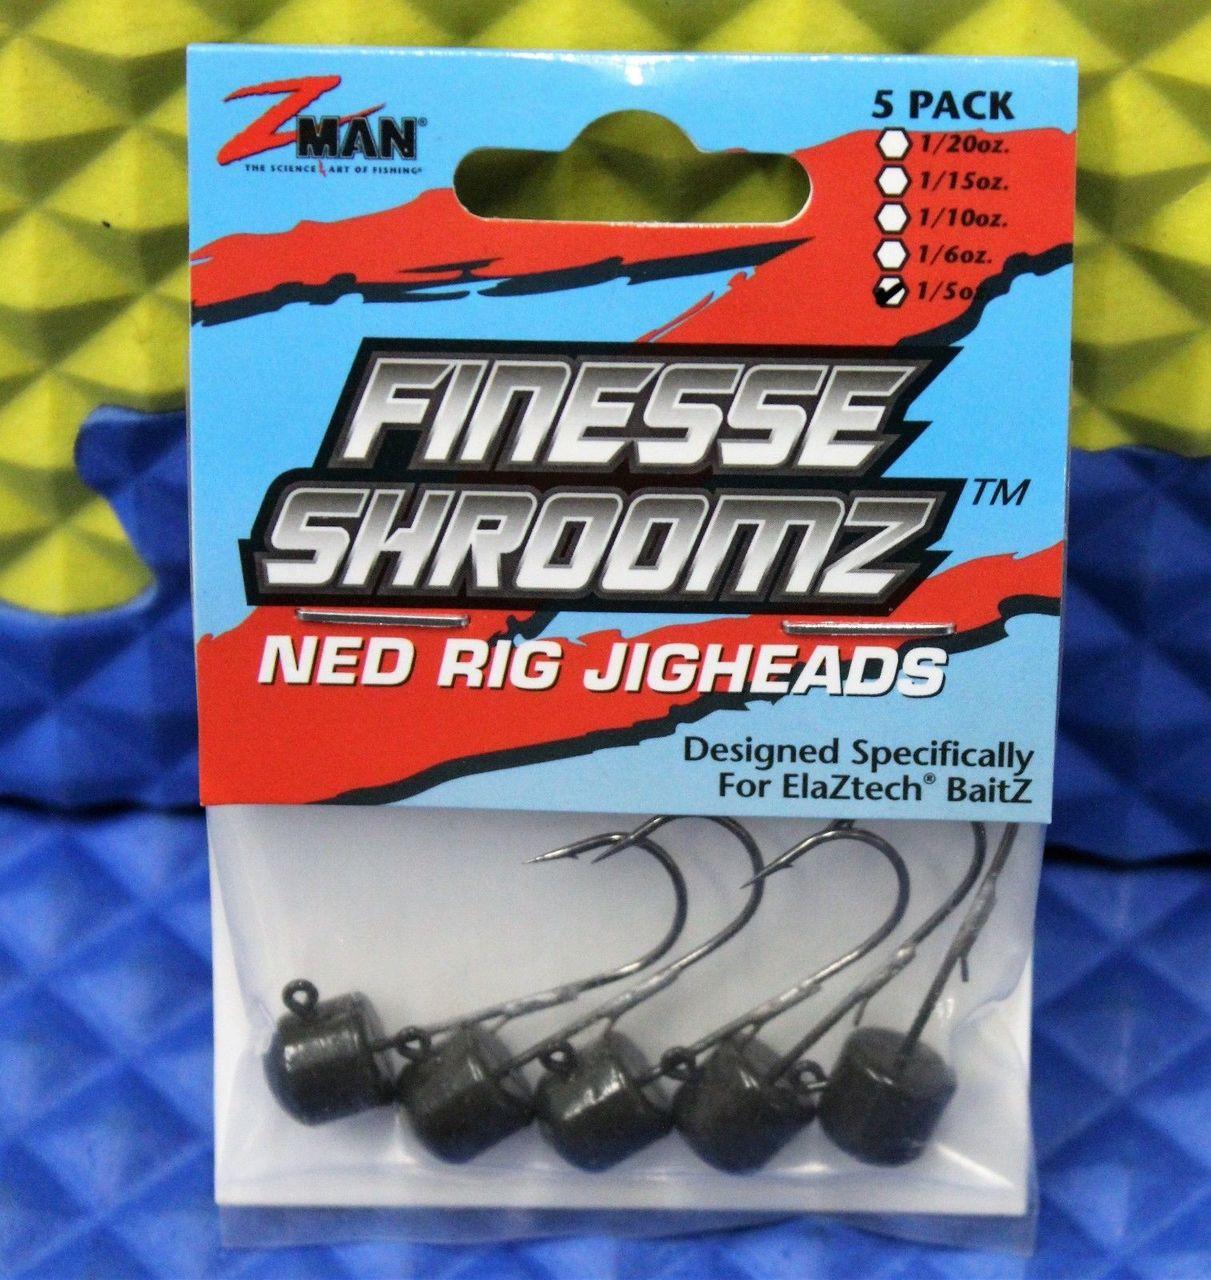 Z-MAN FJH115-01PK5 3070-0906 Finesse ShroomZ Fishing Equipment